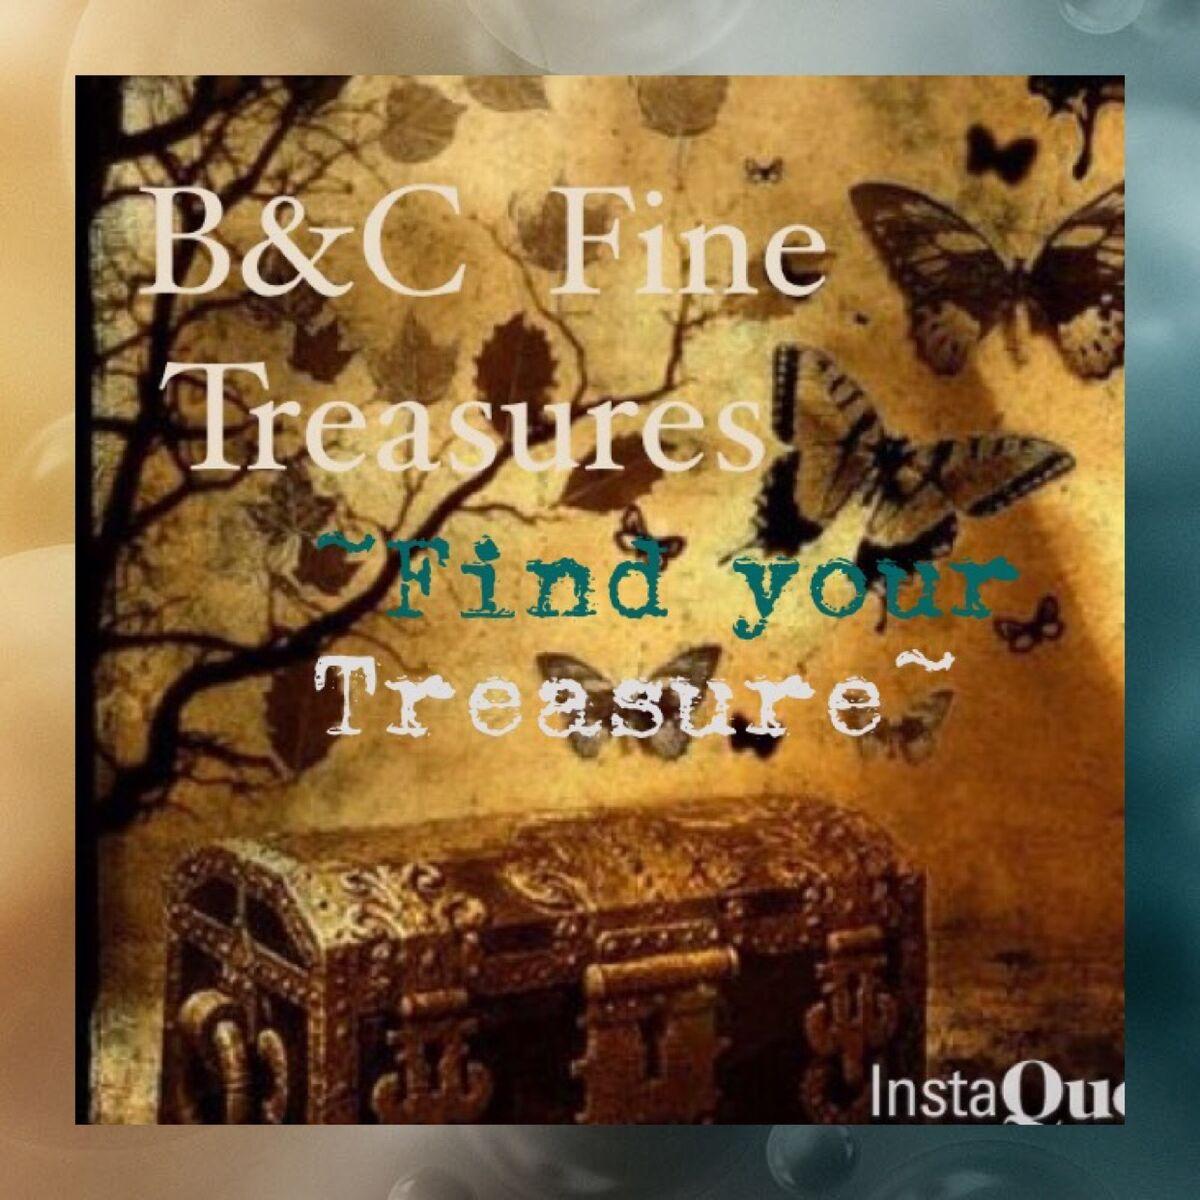 B&C Fine Treasures